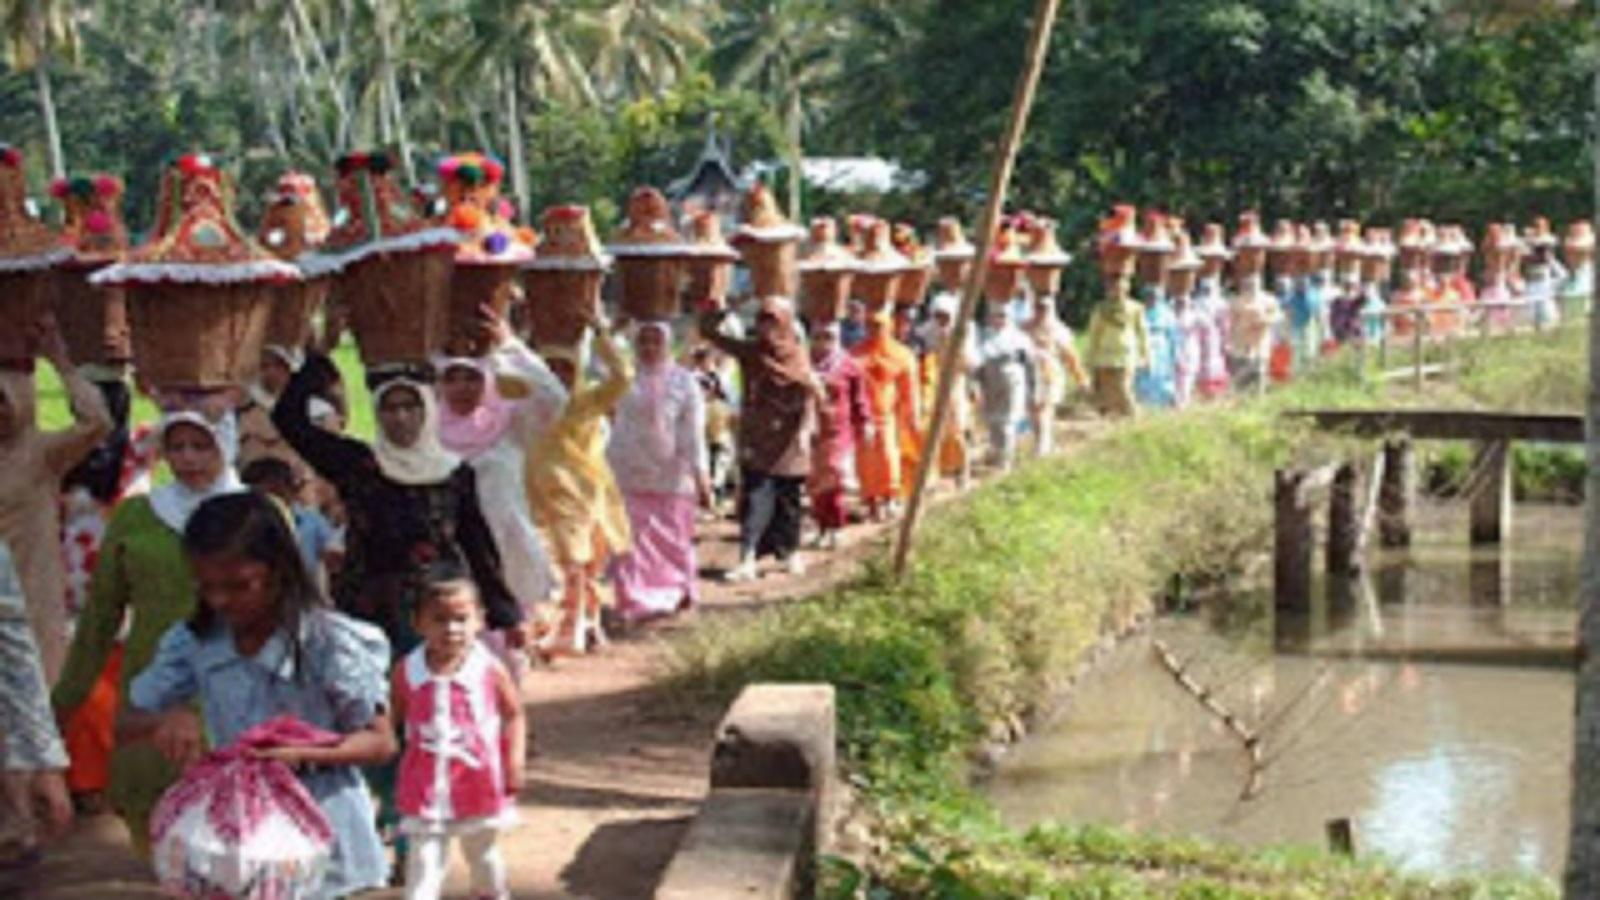 Good Governance dalam Sistem Kekerabatan Matrilineal di Minangkabau